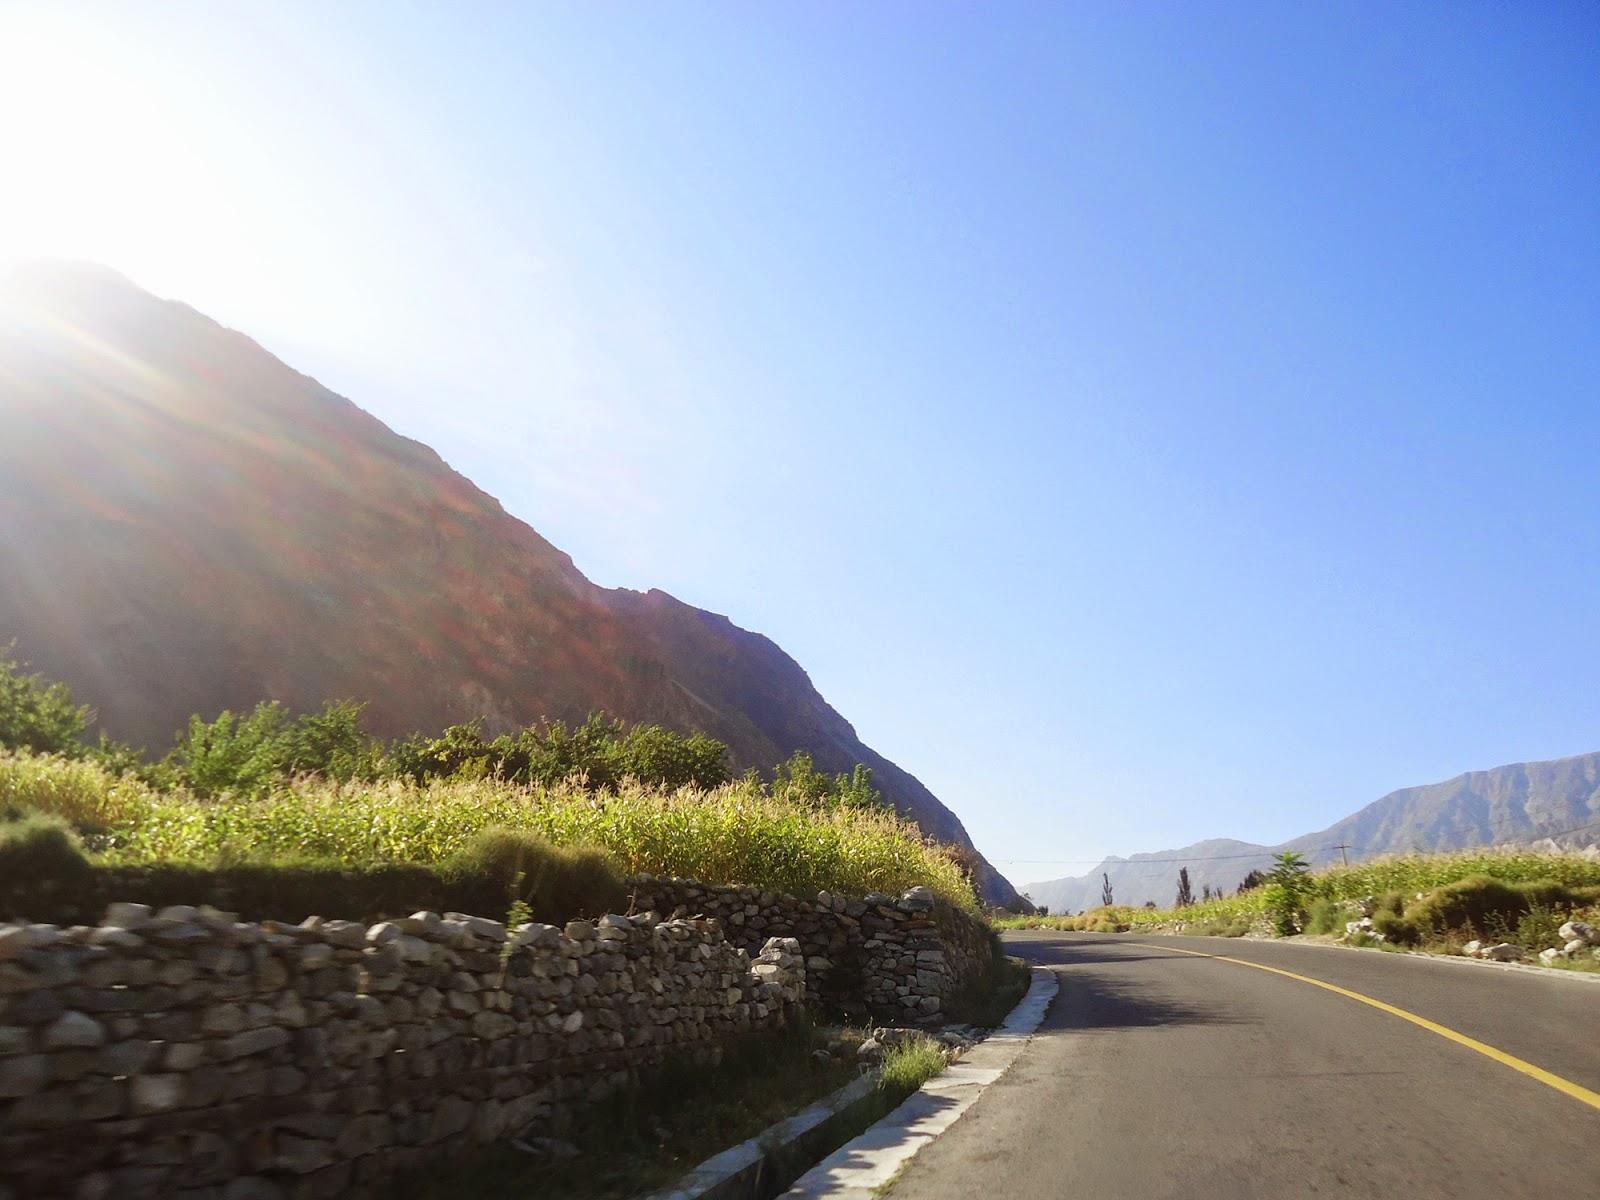 The Hunza Valley, Gilgit Baltistan